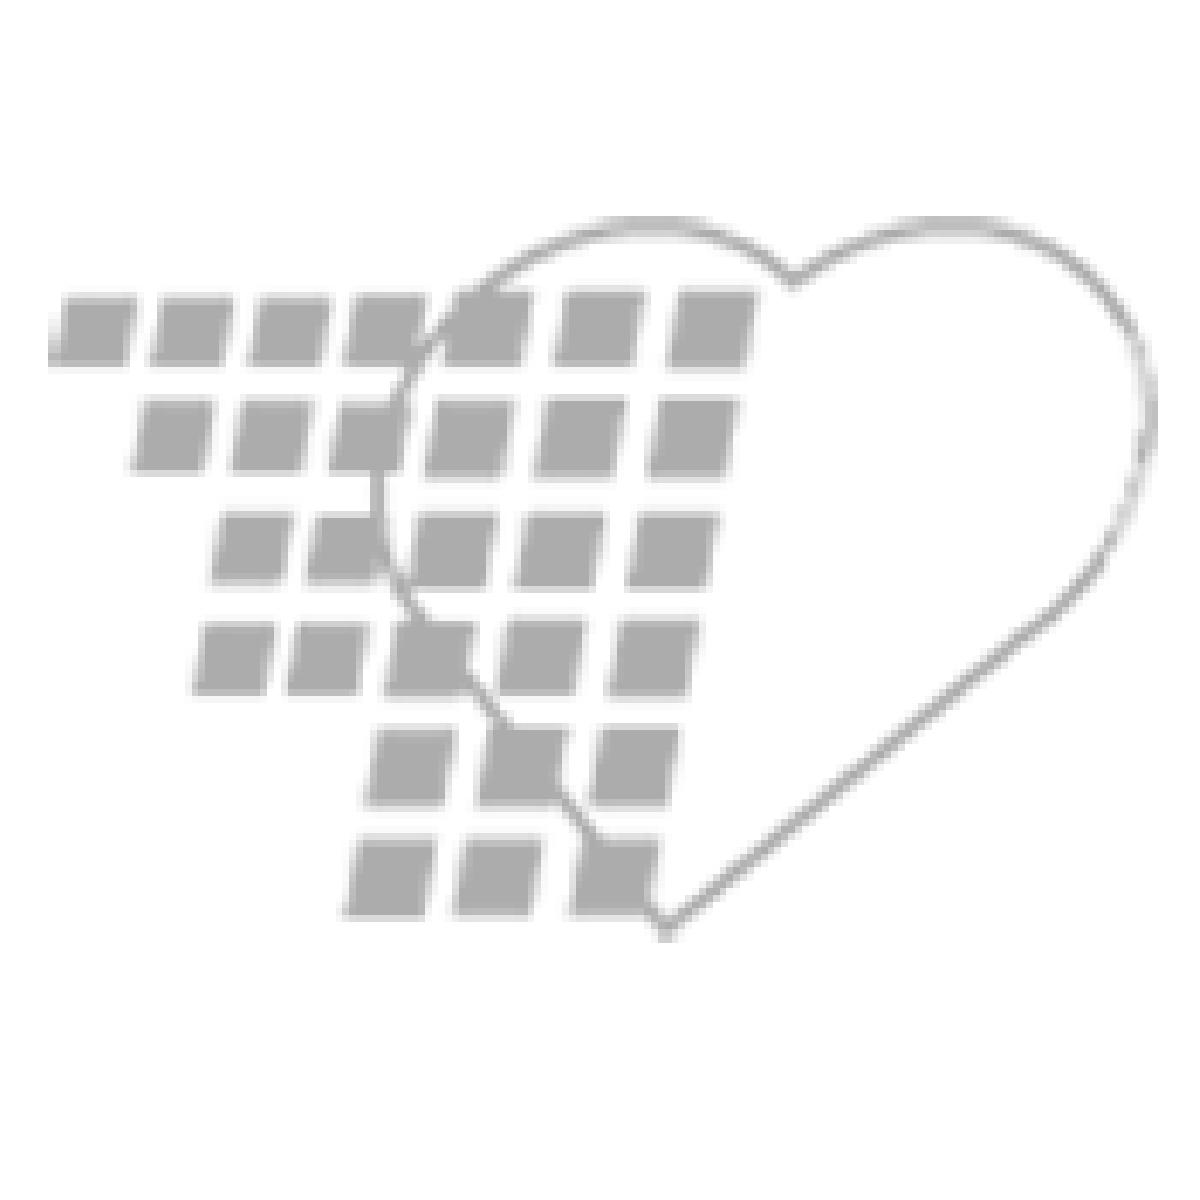 08-75-1707 - Non-Conductive Shoe Covers